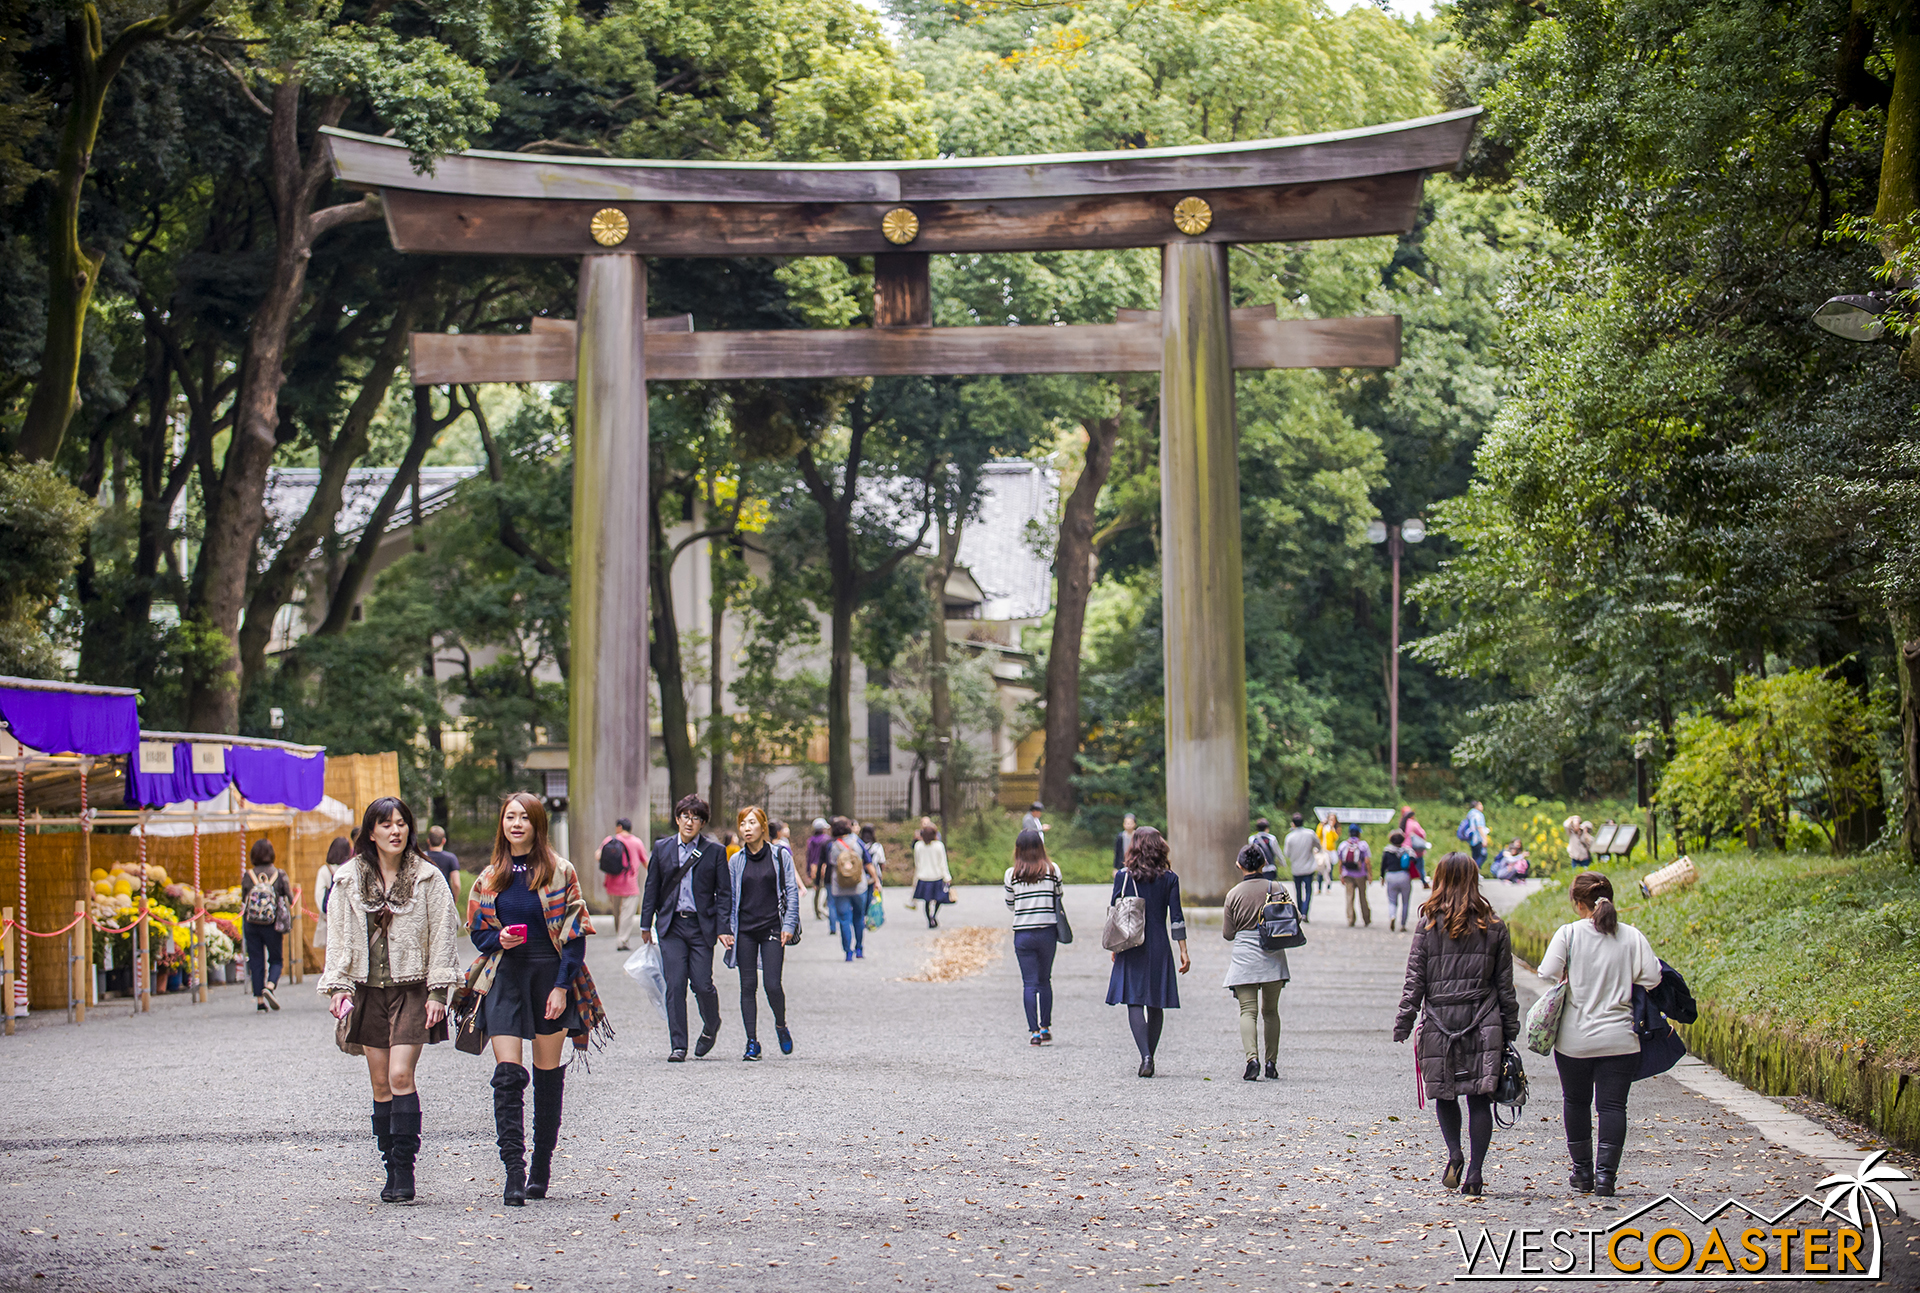 Yoyogi Park is massive and is also where tourists can find Meiji Jingu Shrine.